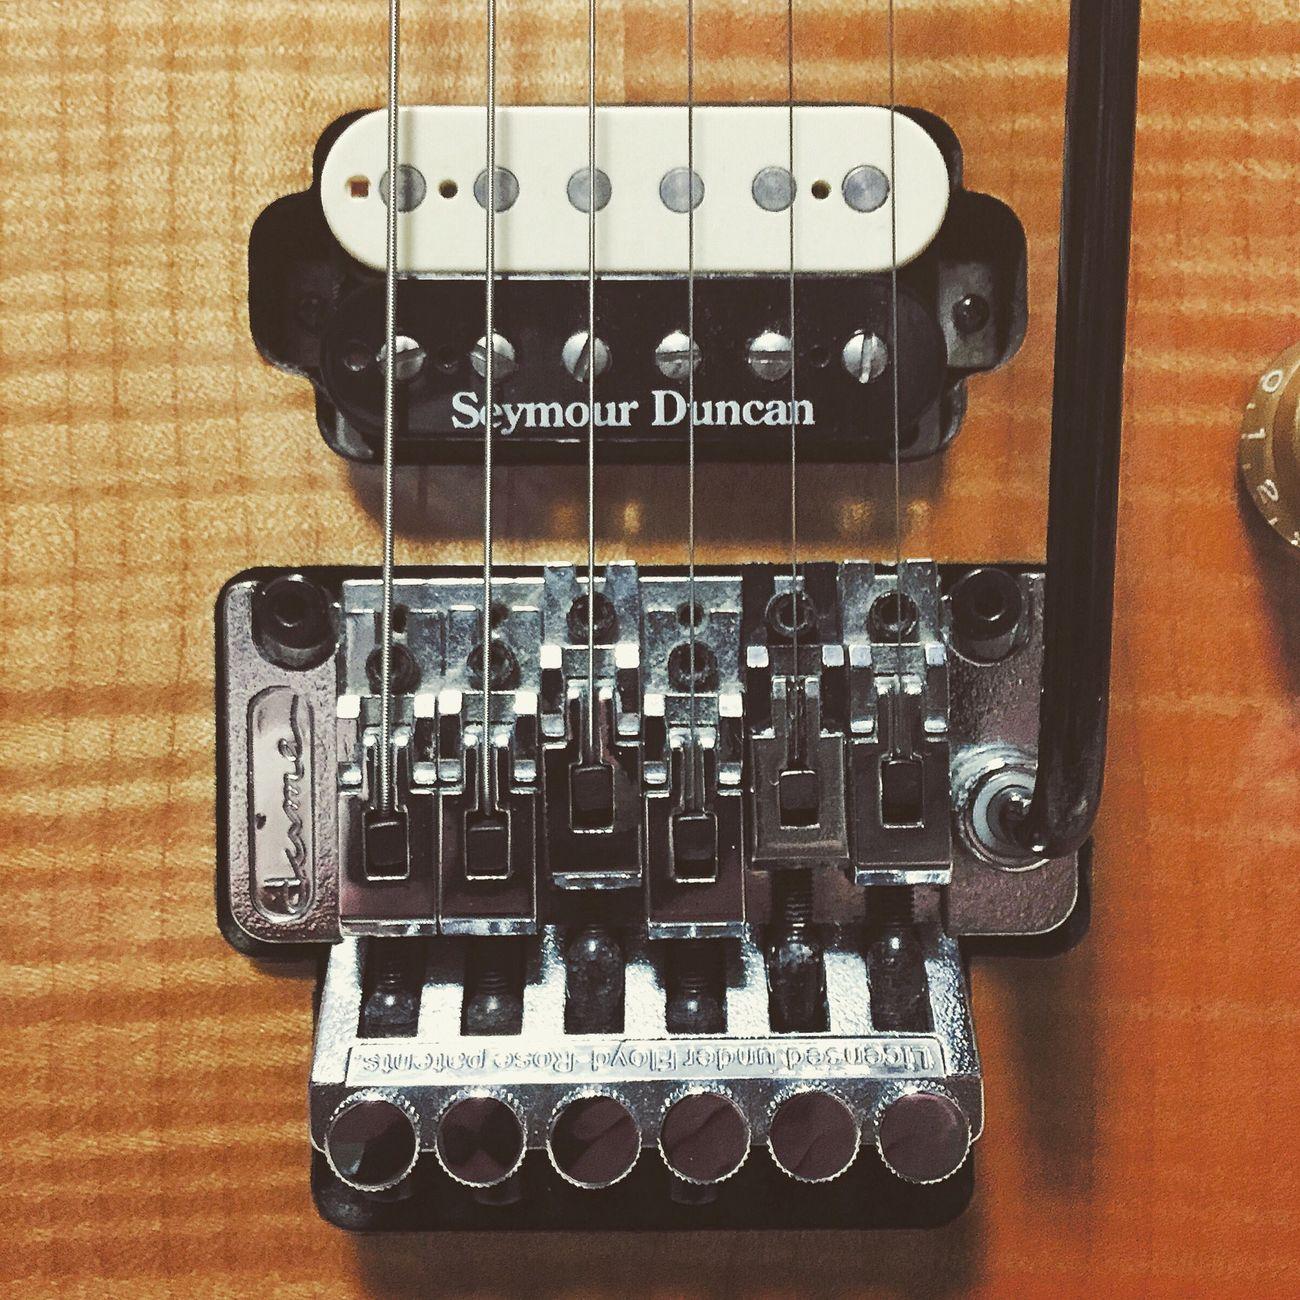 My Guitar Guitar Seymour Duncan Dame